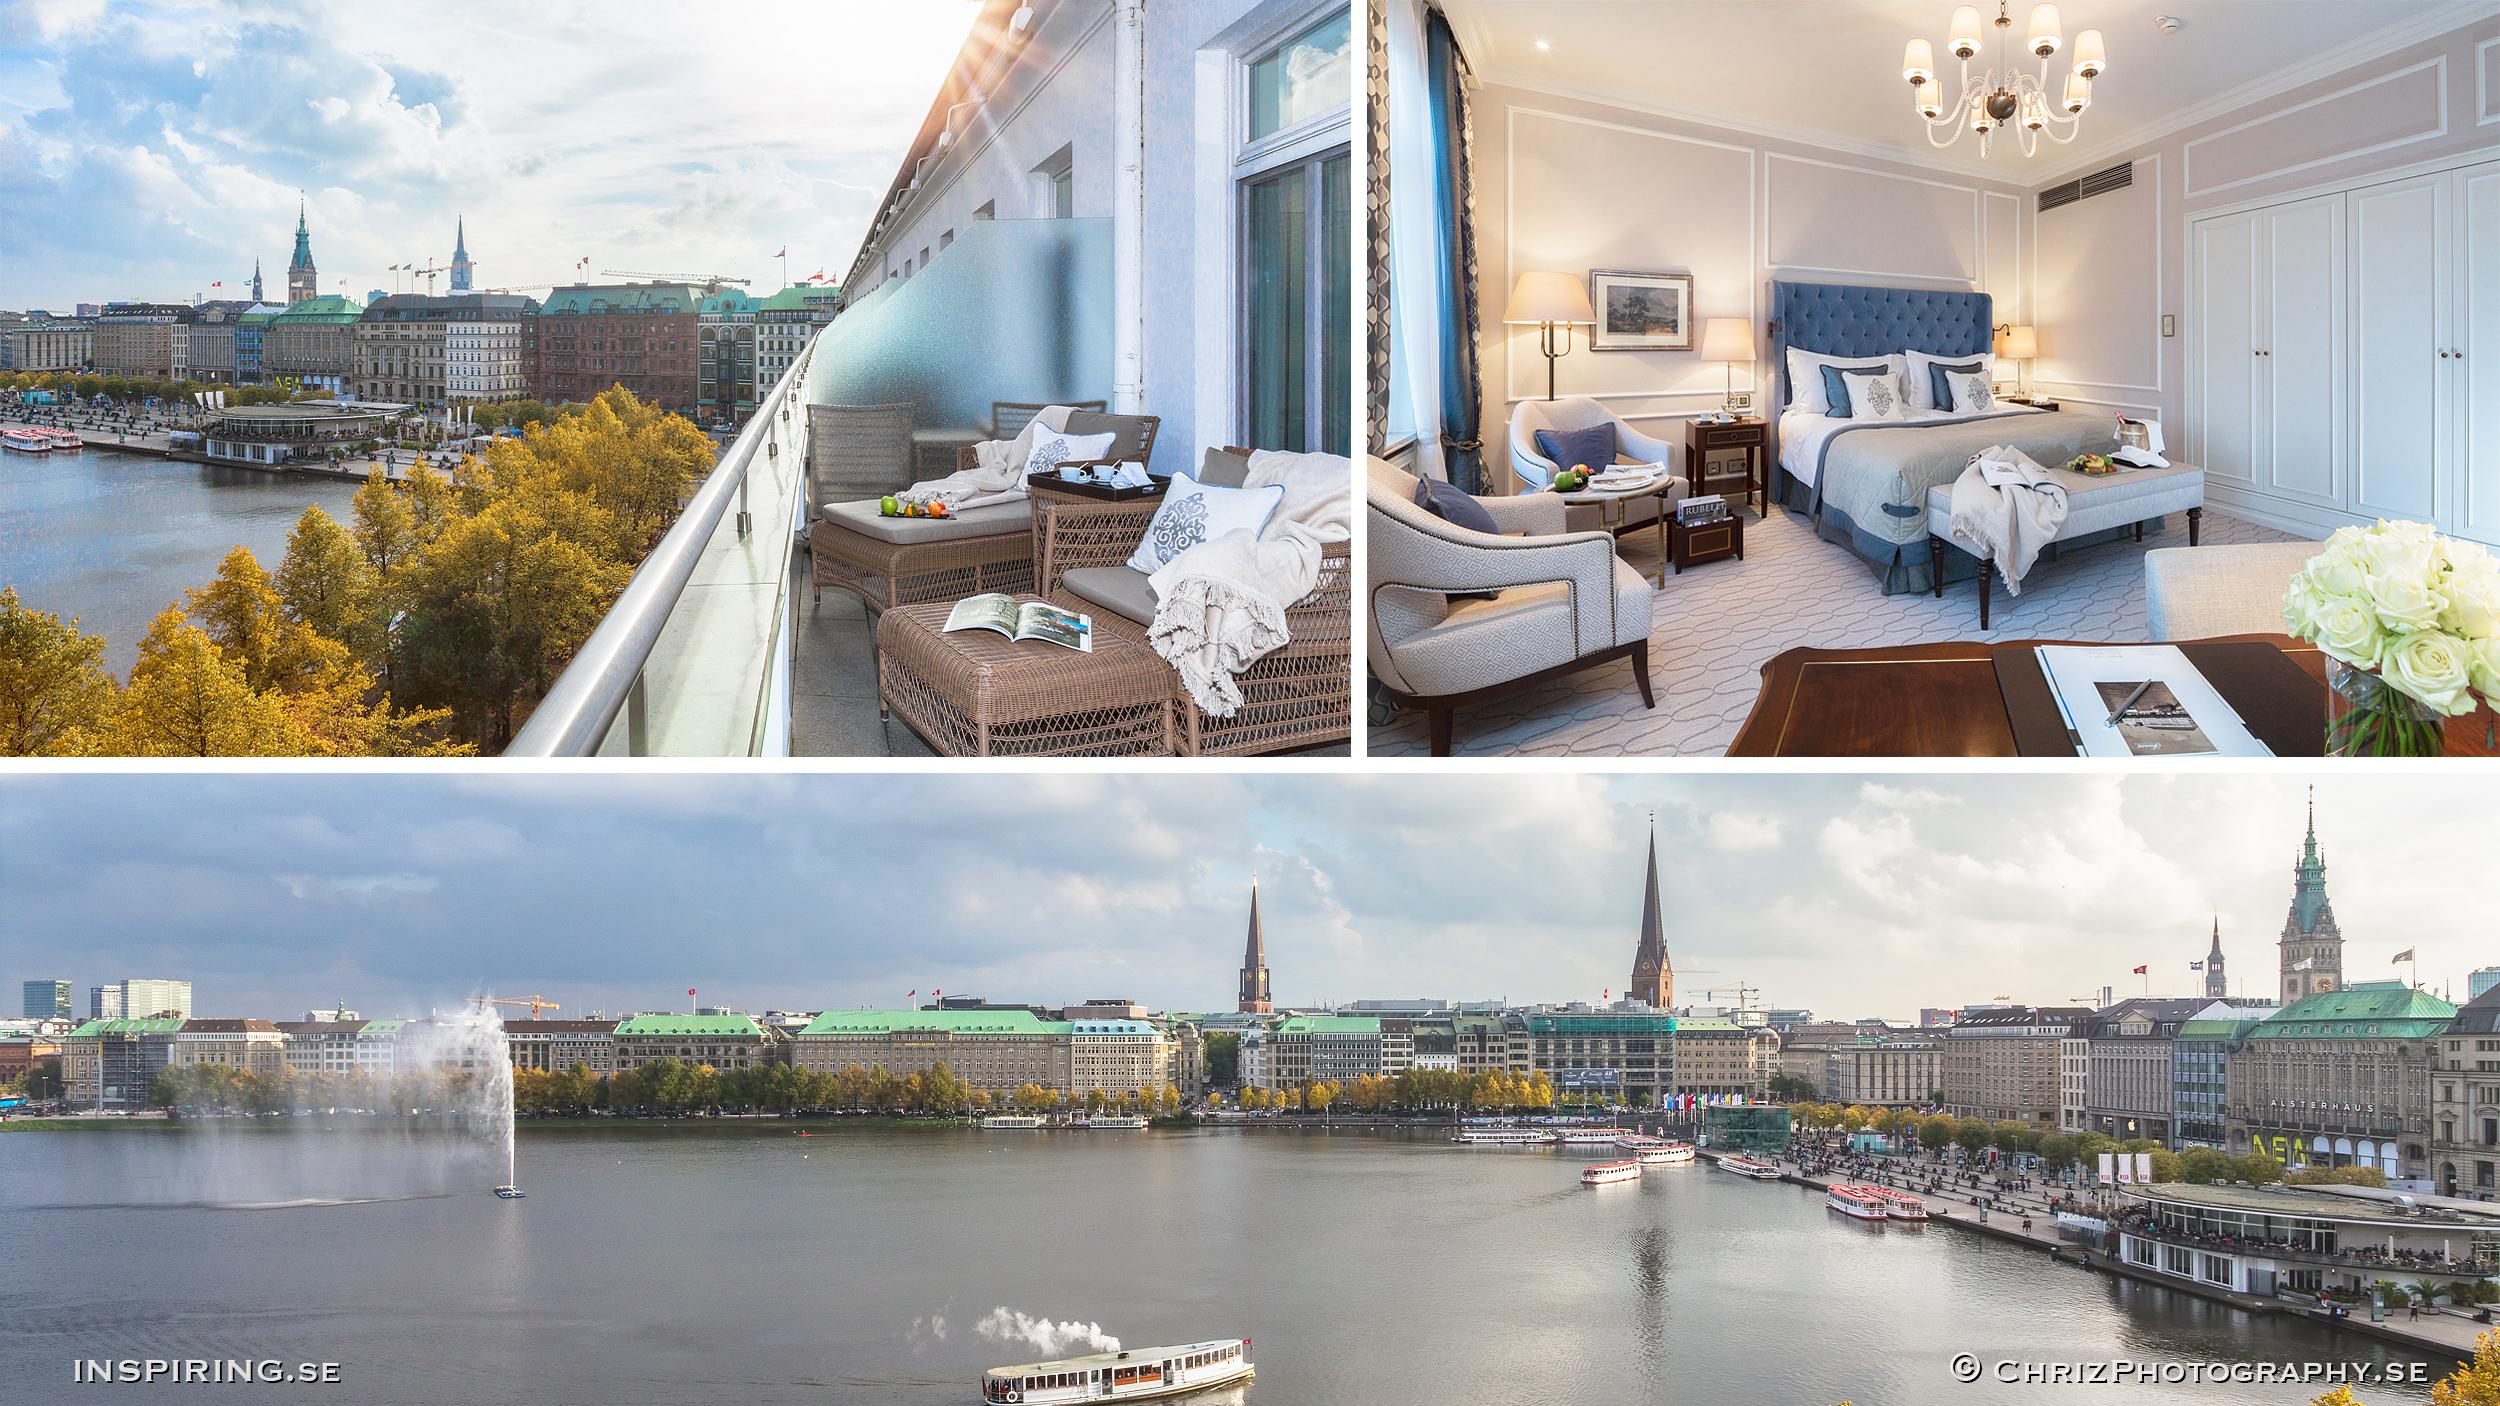 Fairmont_HotelVierJahreszeiten_Hamburg_Inspiring.se_copyright_ChrizPhotography.se_8.jpg